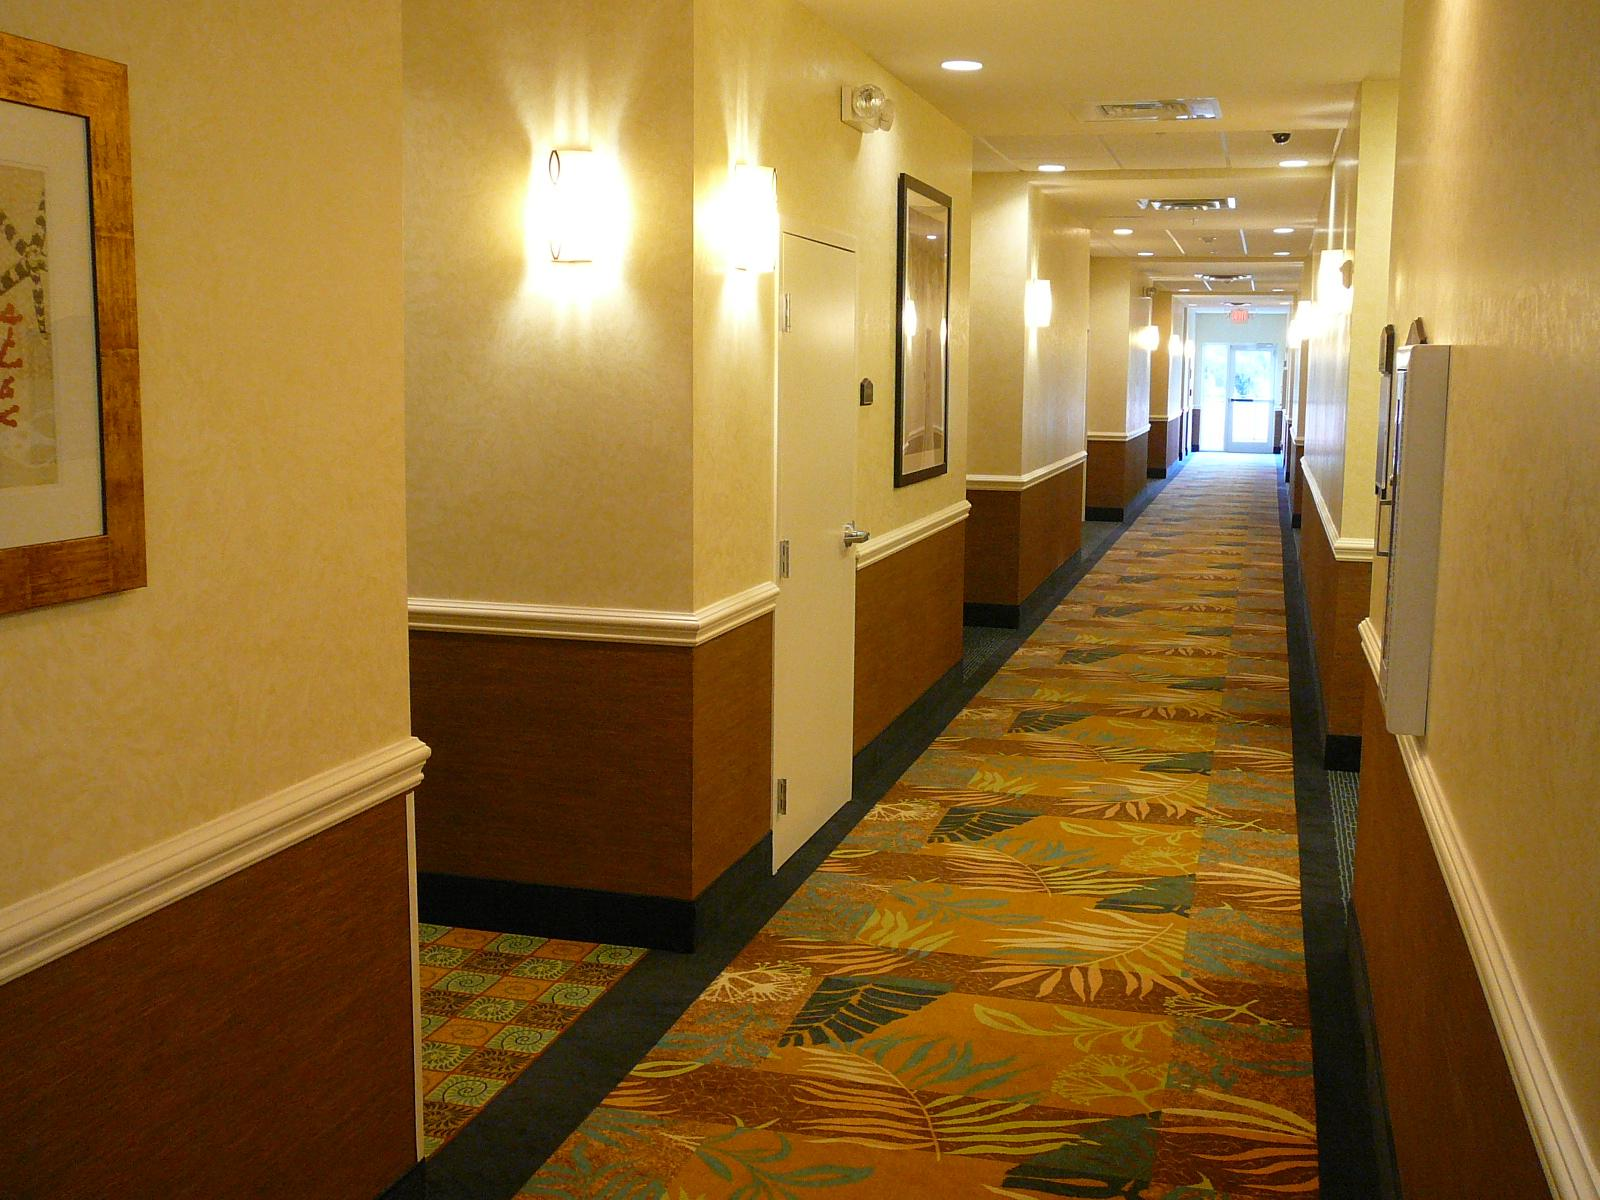 Corridor Design: 1000+ Images About Corridor Design On Pinterest